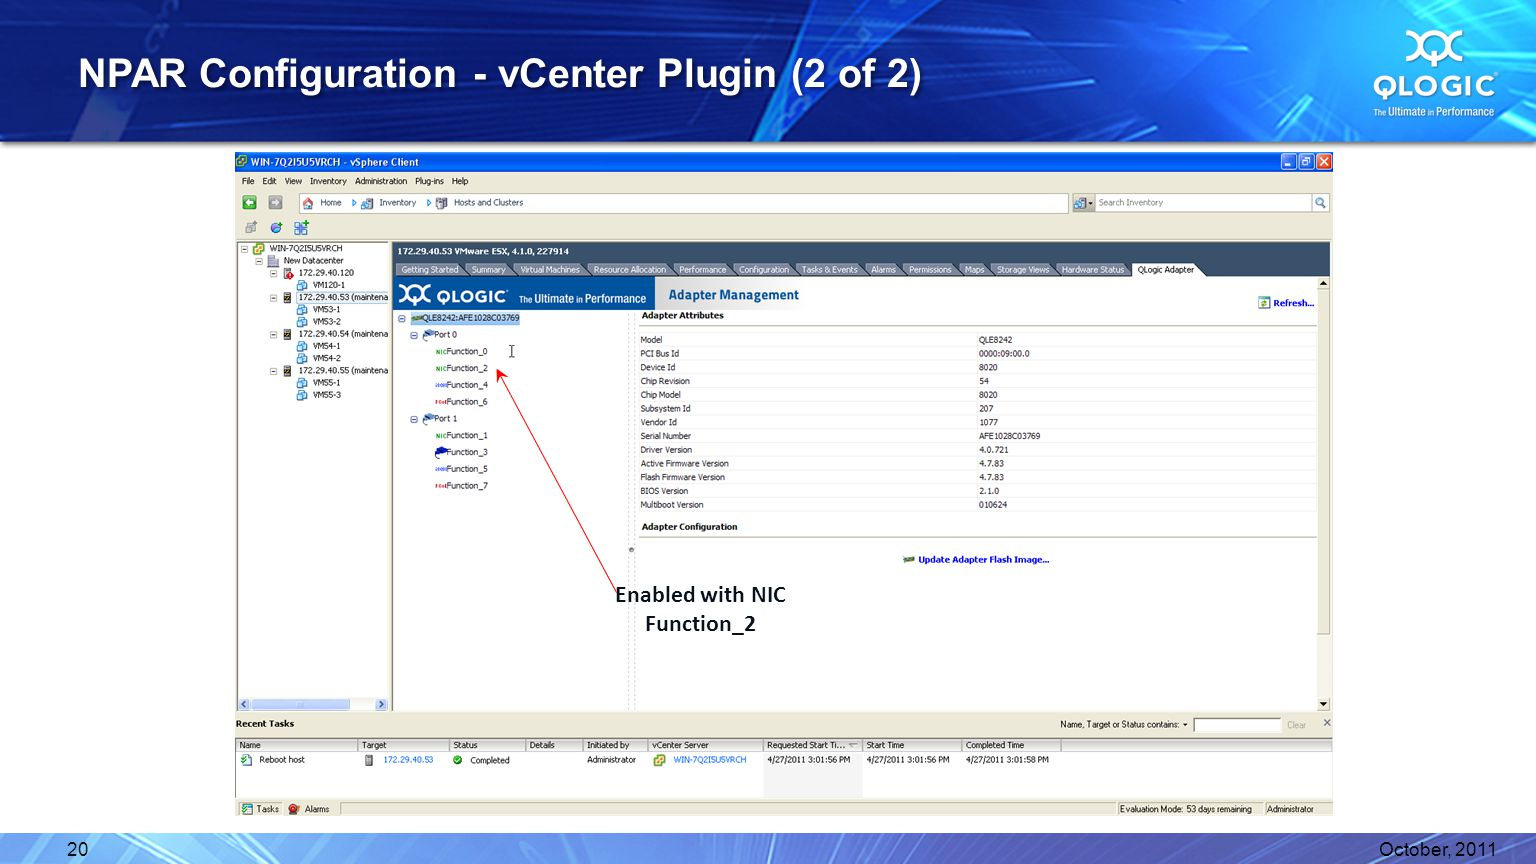 NPAR Configuration - vCenter Plugin (2 of 2)